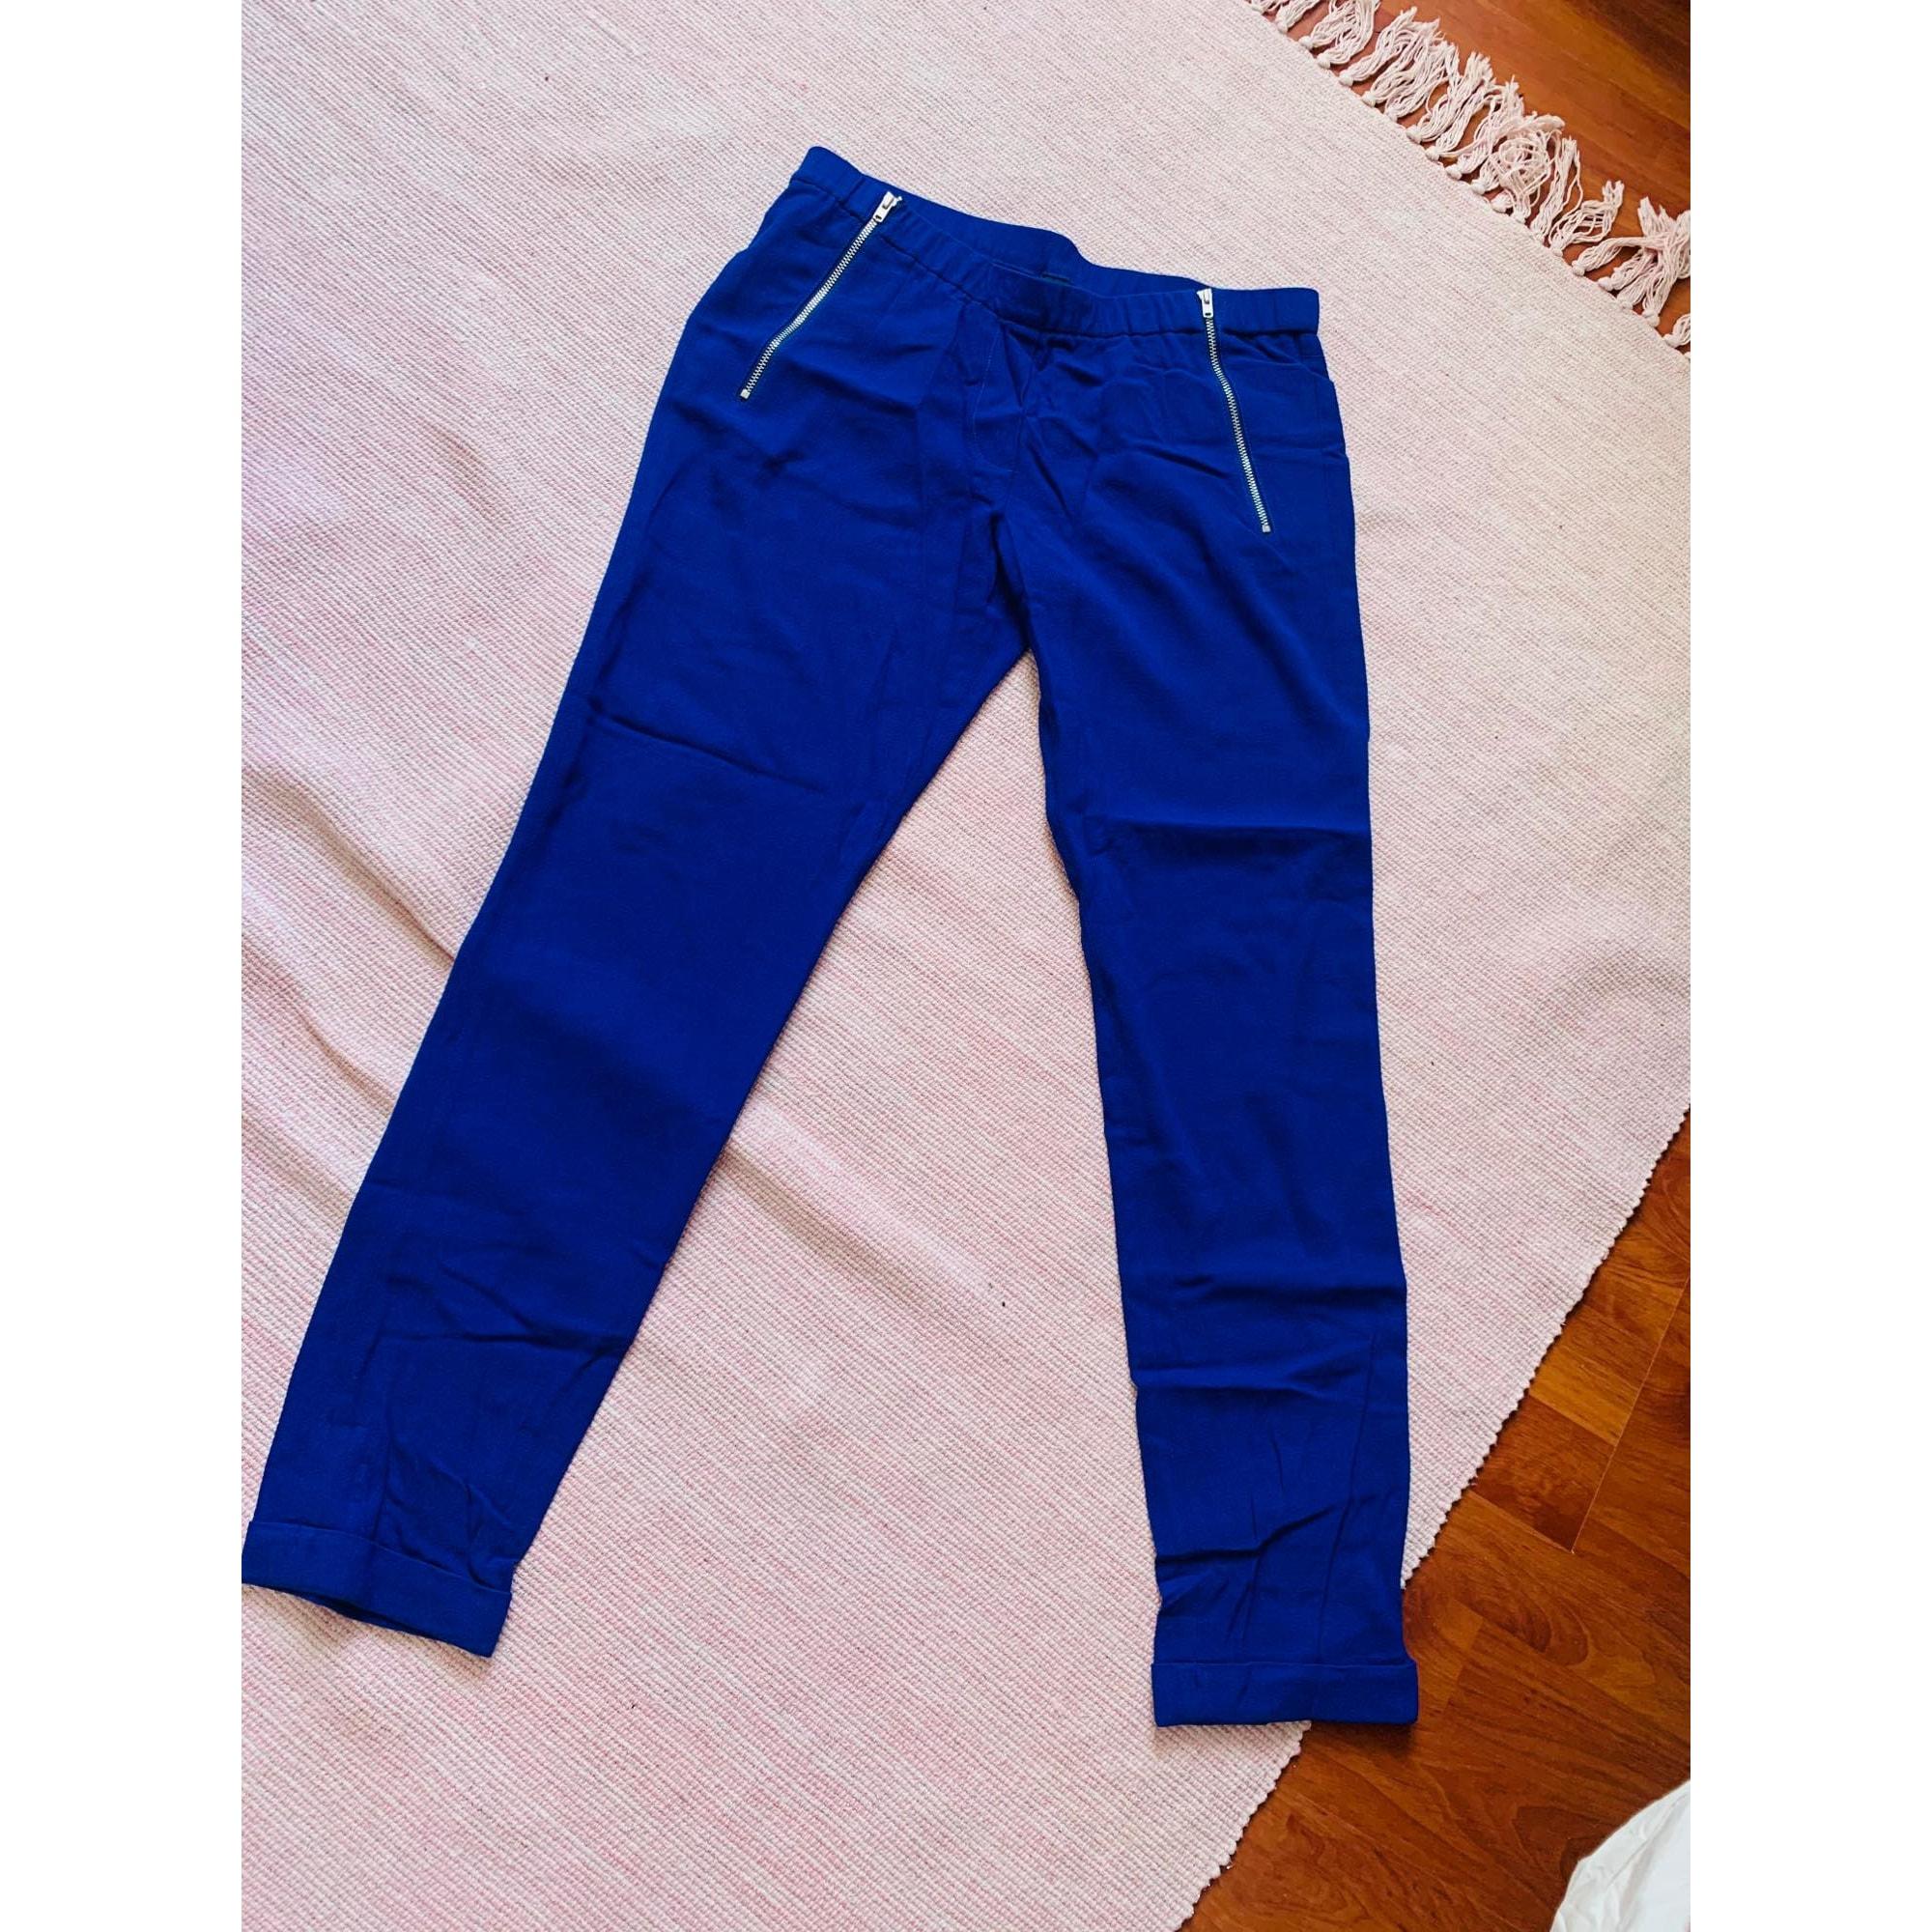 Pantalon droit THE KOOPLES Bleu, bleu marine, bleu turquoise